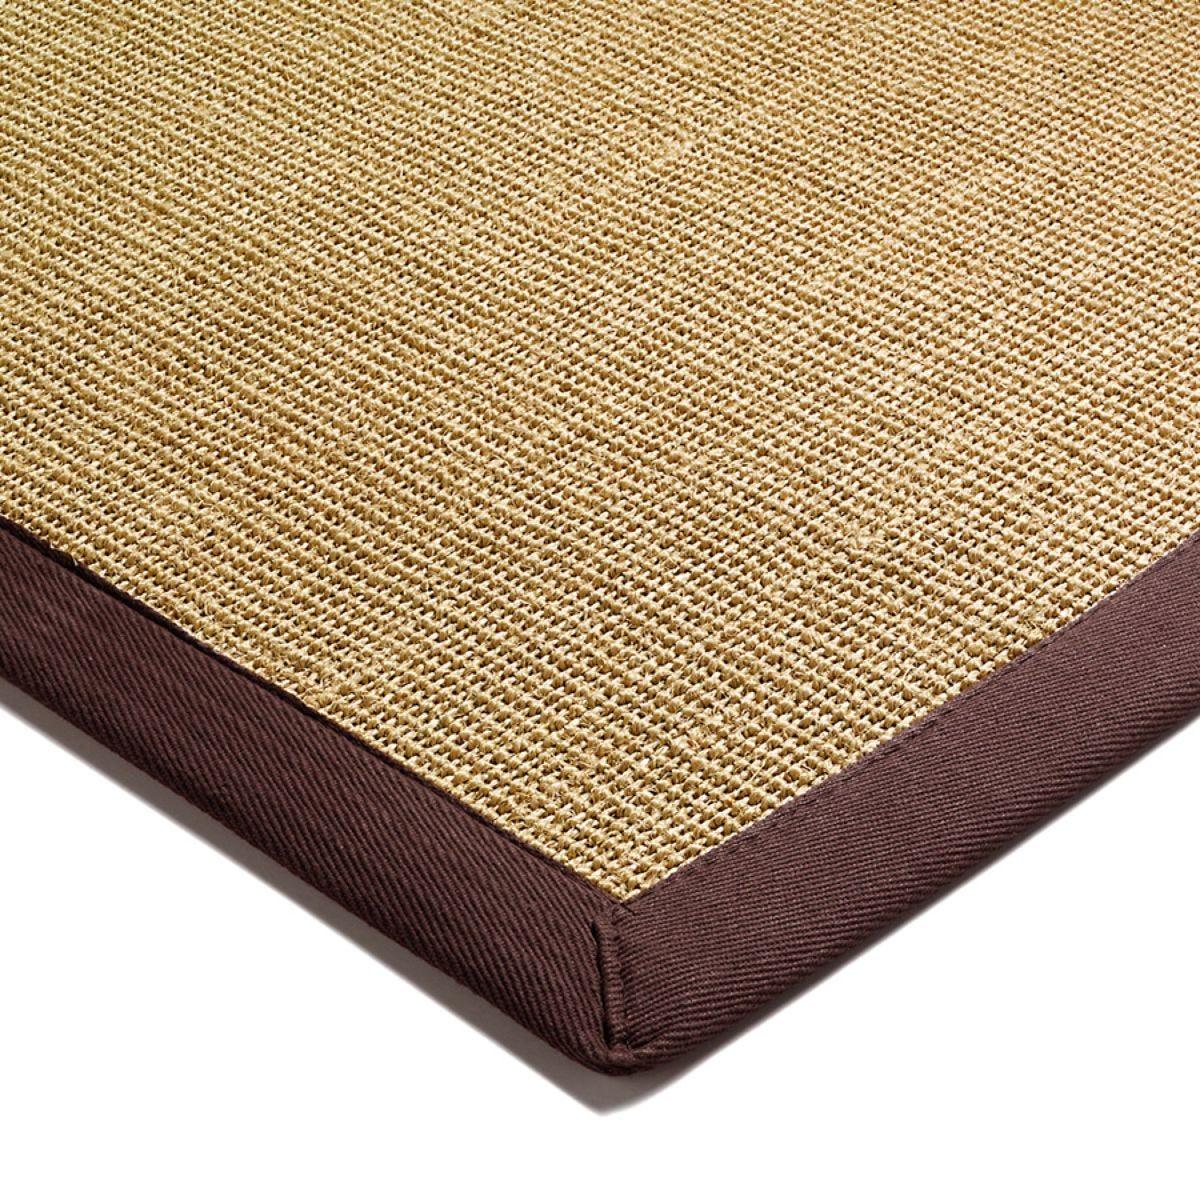 Asiatic Sisal Rug 300 x 200cm - Chocolate